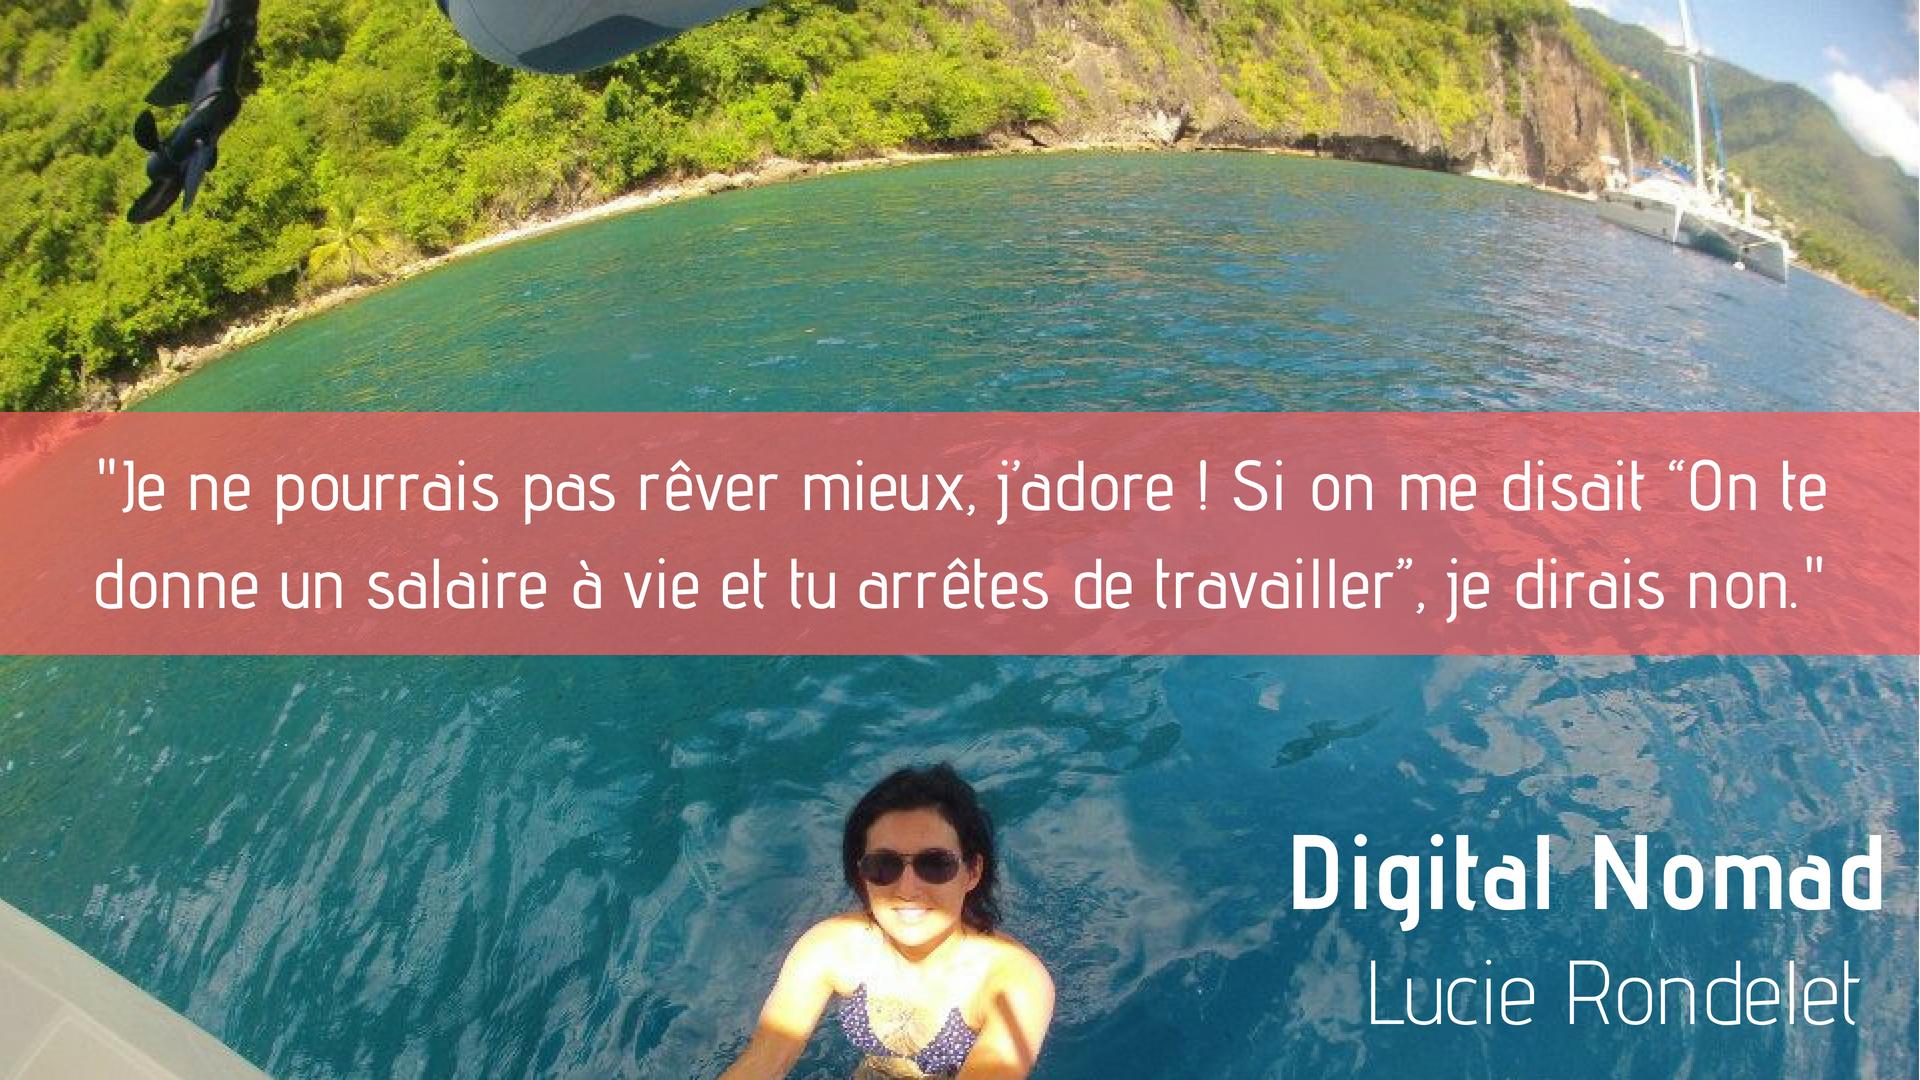 Lucie Rondelet, Digital Nomad Rédactrice Web Freelance